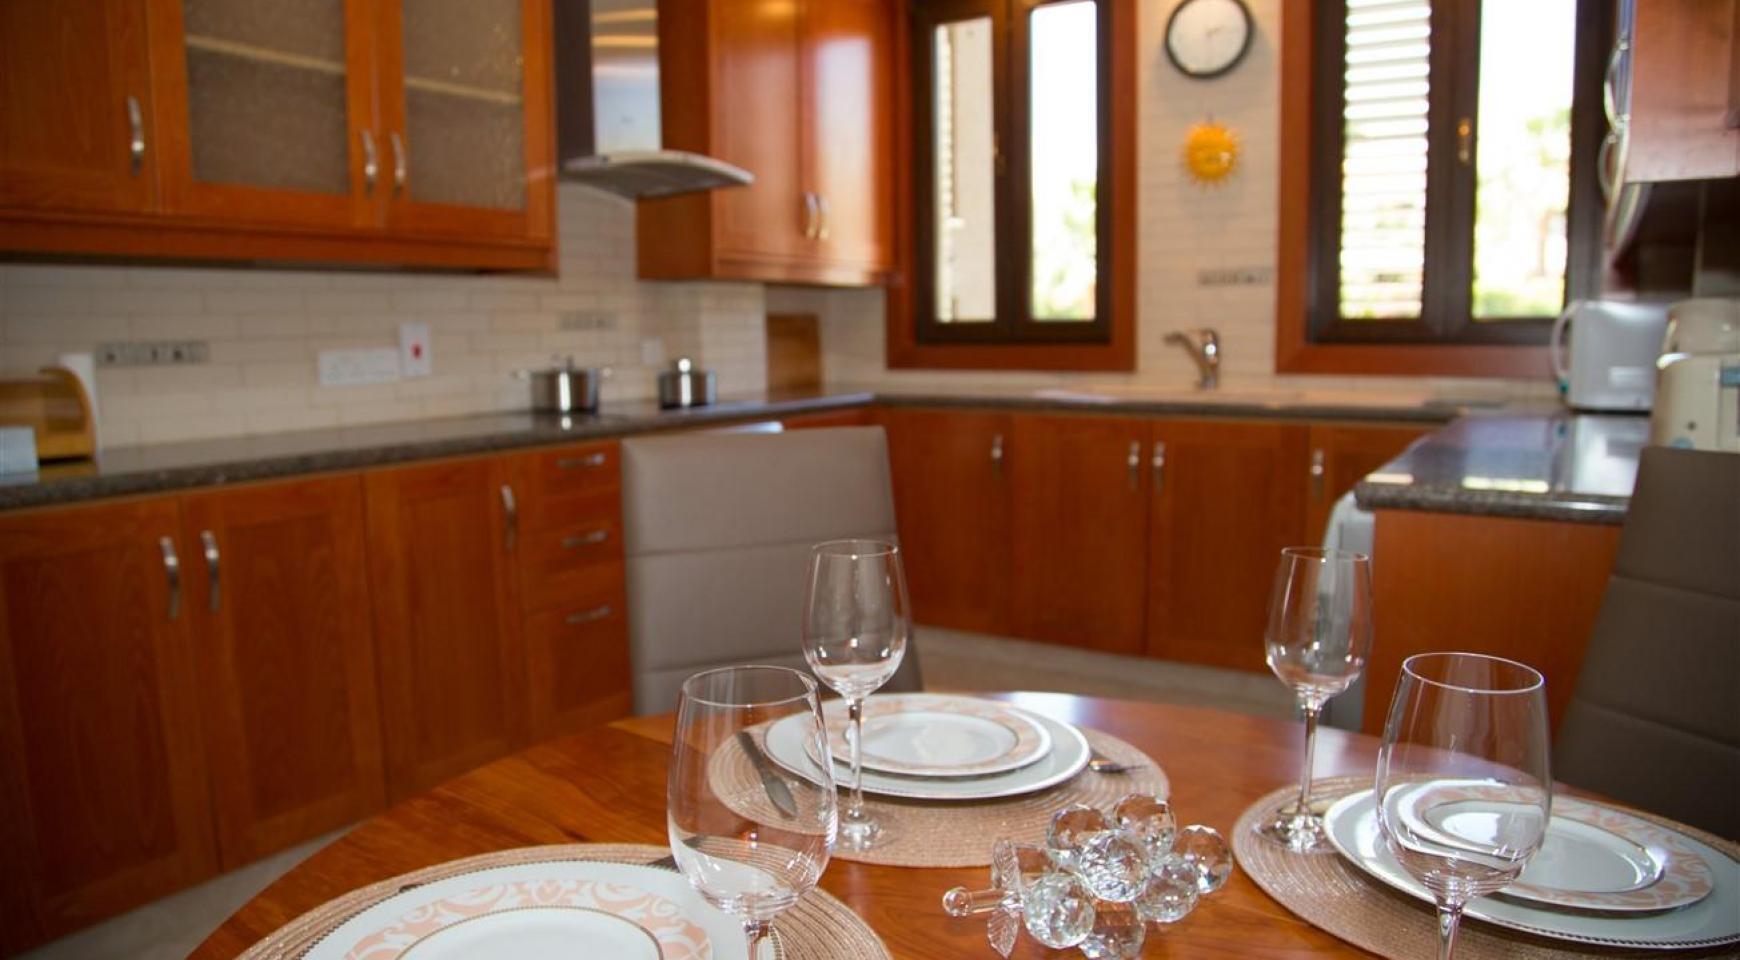 3-Спальная Квартира на Берегу Моря в Комплексе Thera   - 24